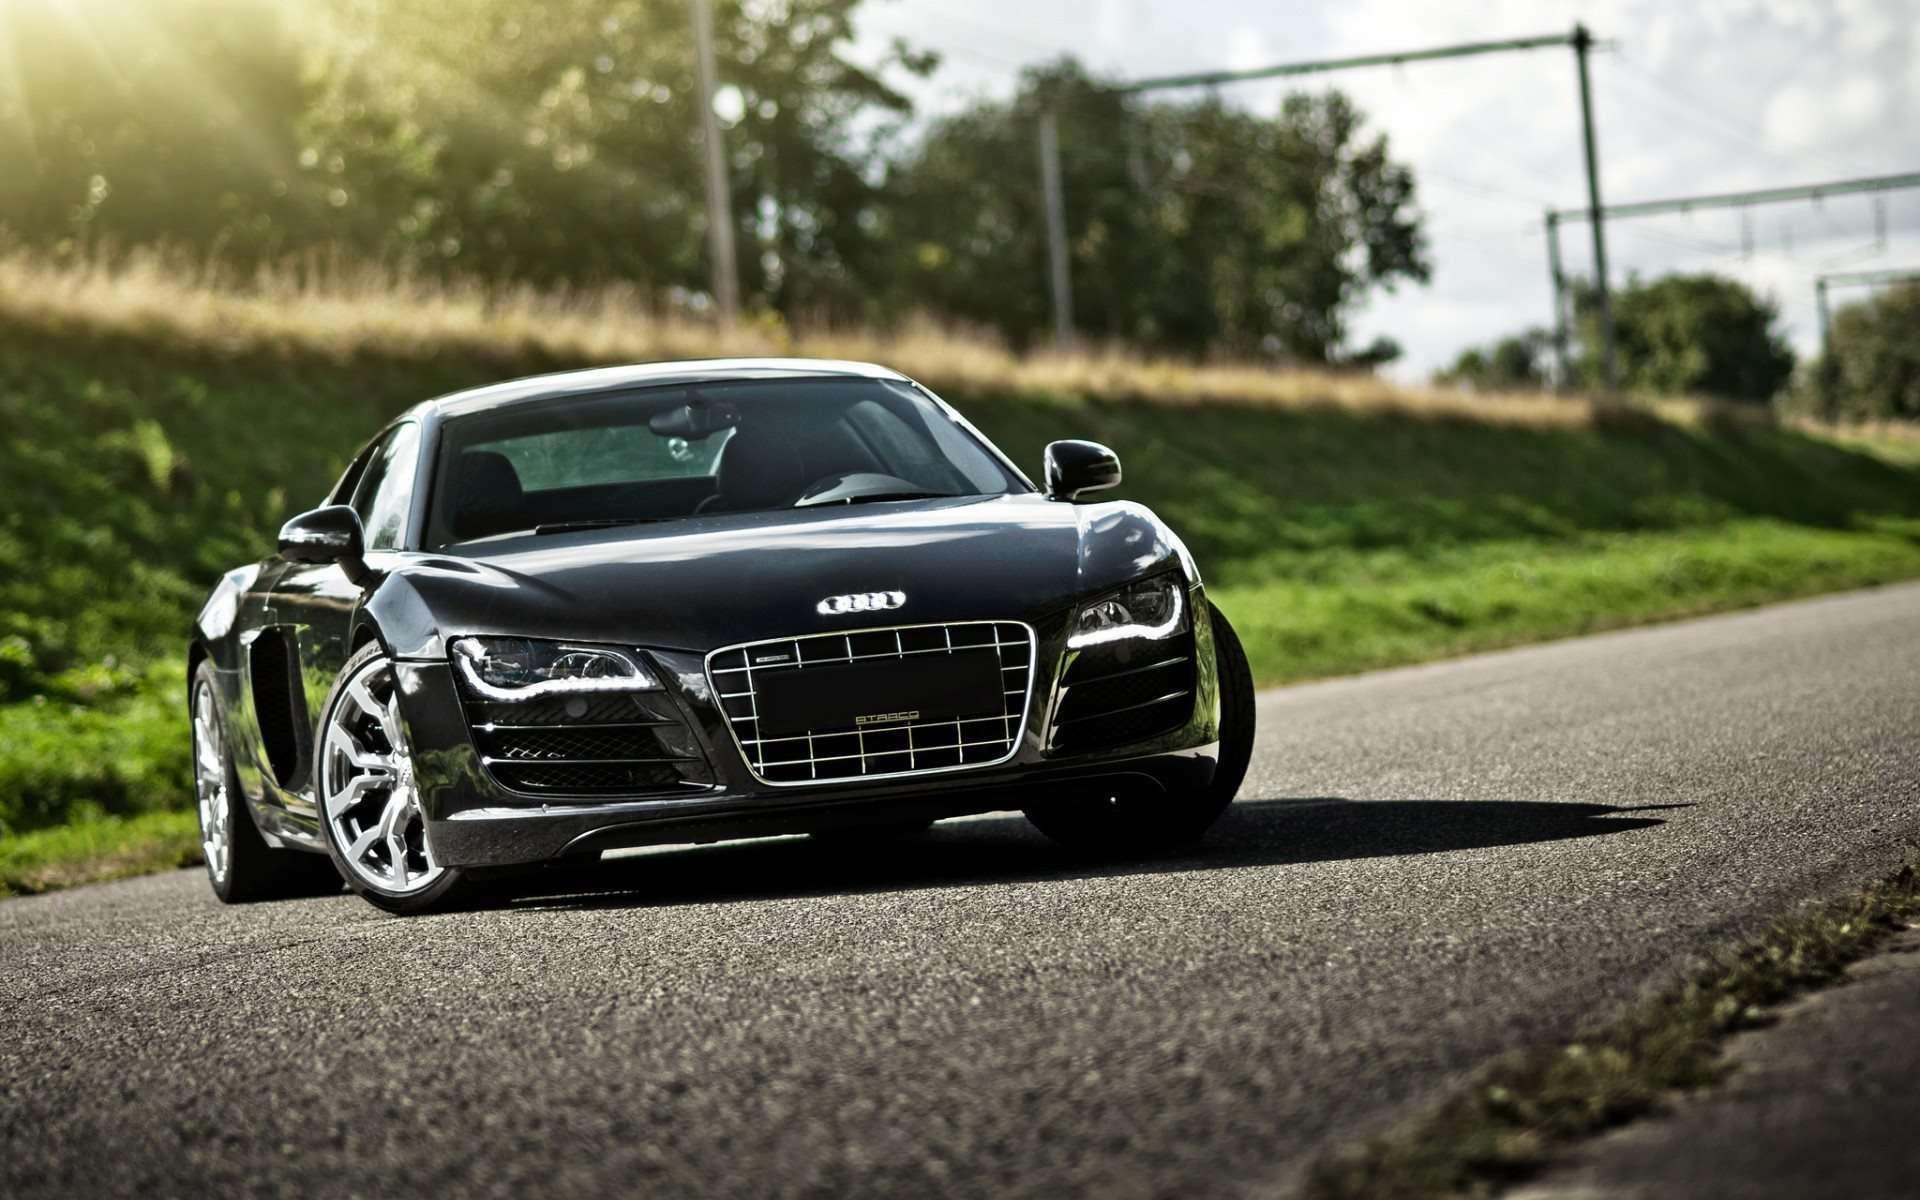 [39+] Matte Black Audi R8 Wallpaper on WallpaperSafari